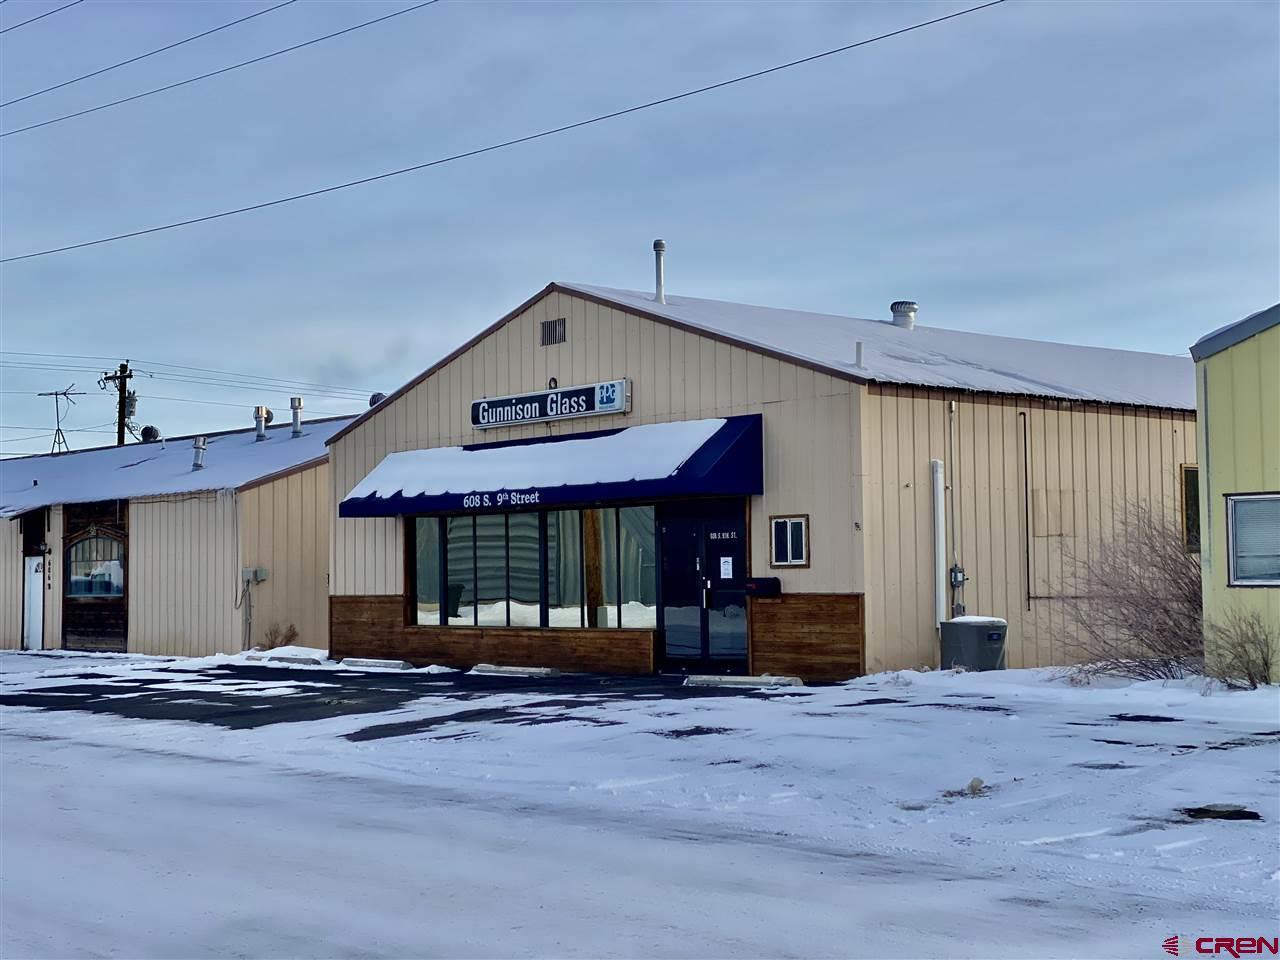 608 S 9th Street, Gunnison, CO 81230